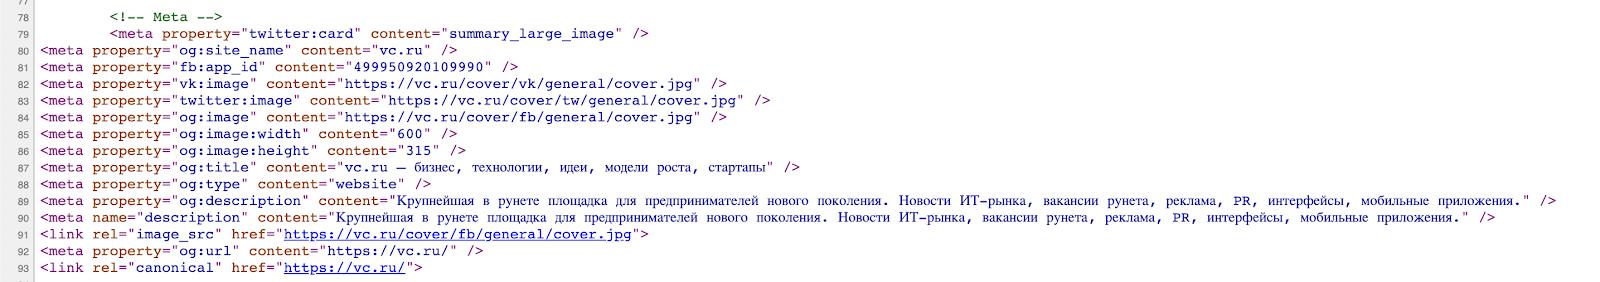 Пример OpenGraph разметки